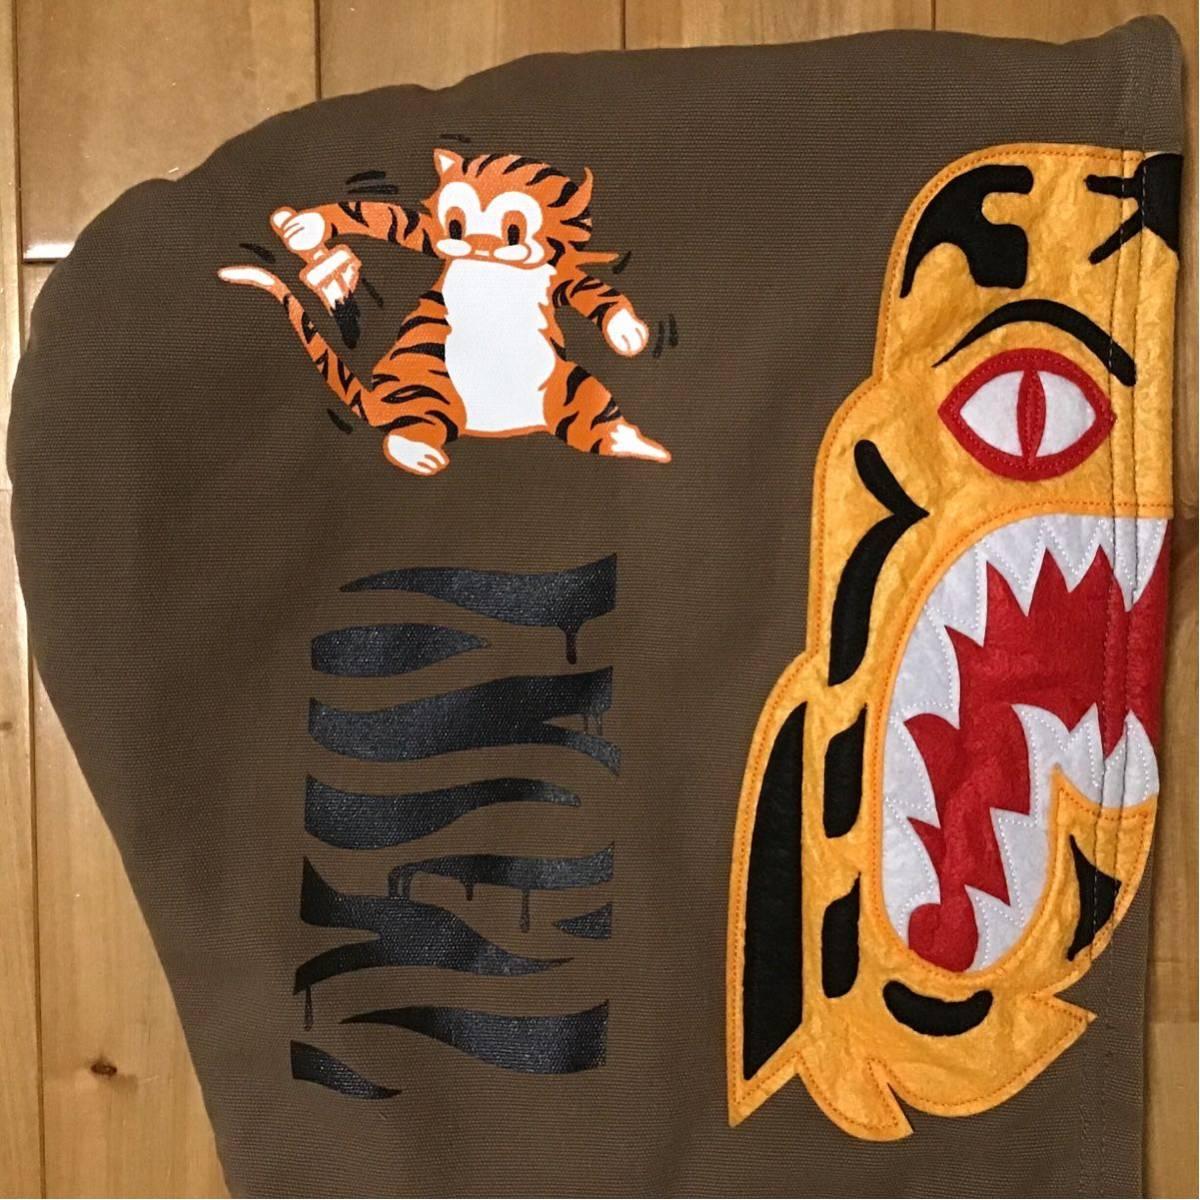 Tiger hoodie work jacket Lサイズ a bathing ape BAPE full zip hoodie エイプ ベイプ アベイシングエイプ タイガー パーカー v62